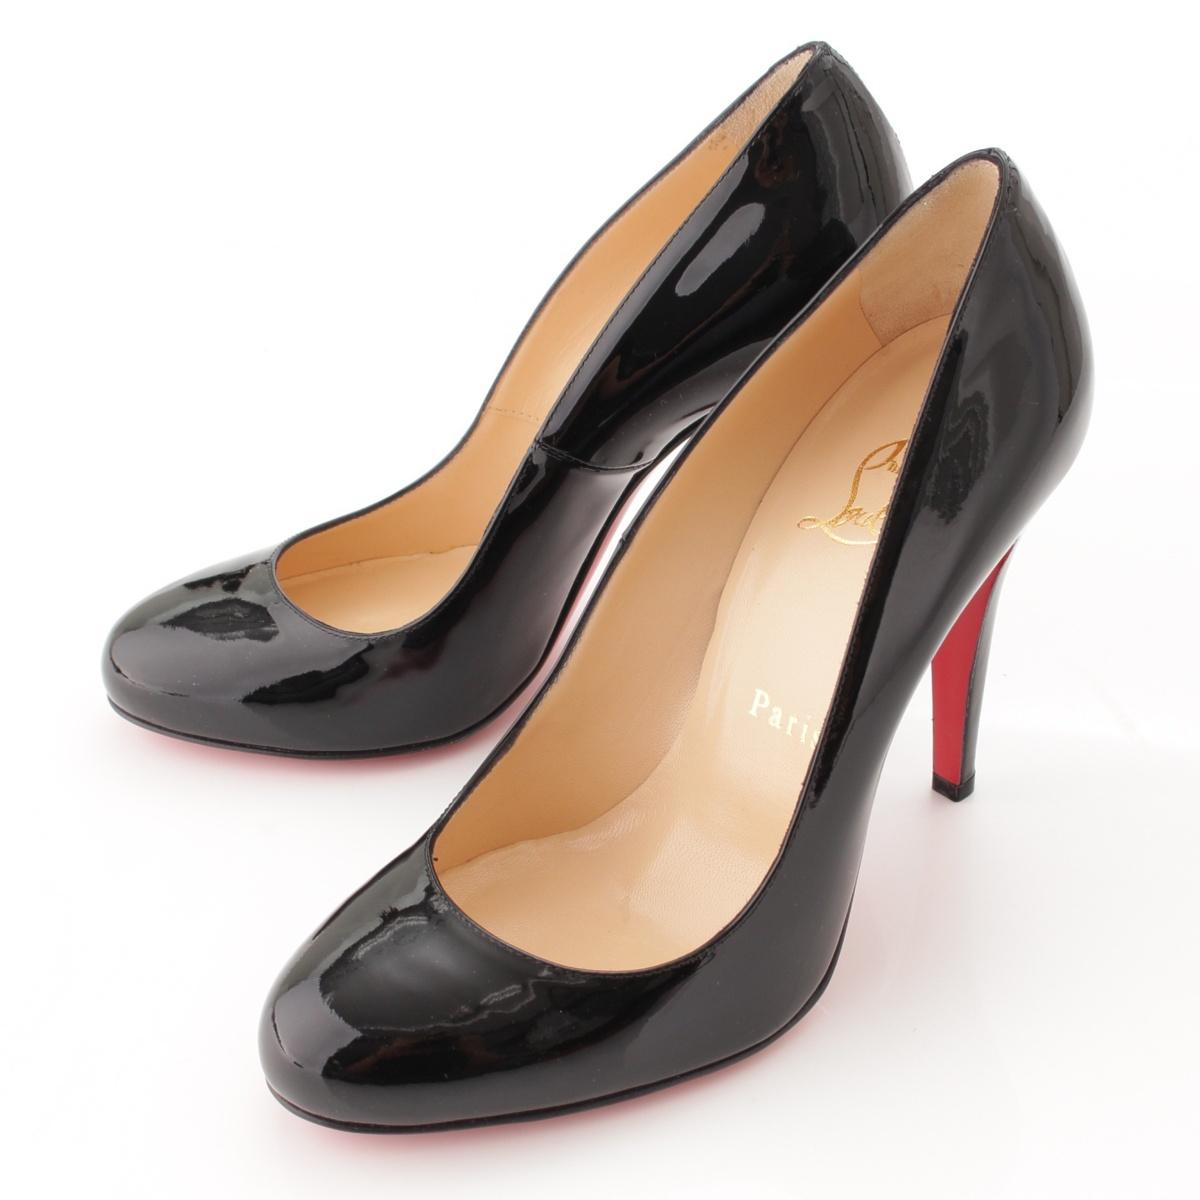 check out 2b104 8a1d1 Christian Louboutin RON RON patent heel pumps black 36 1/2-free 57595